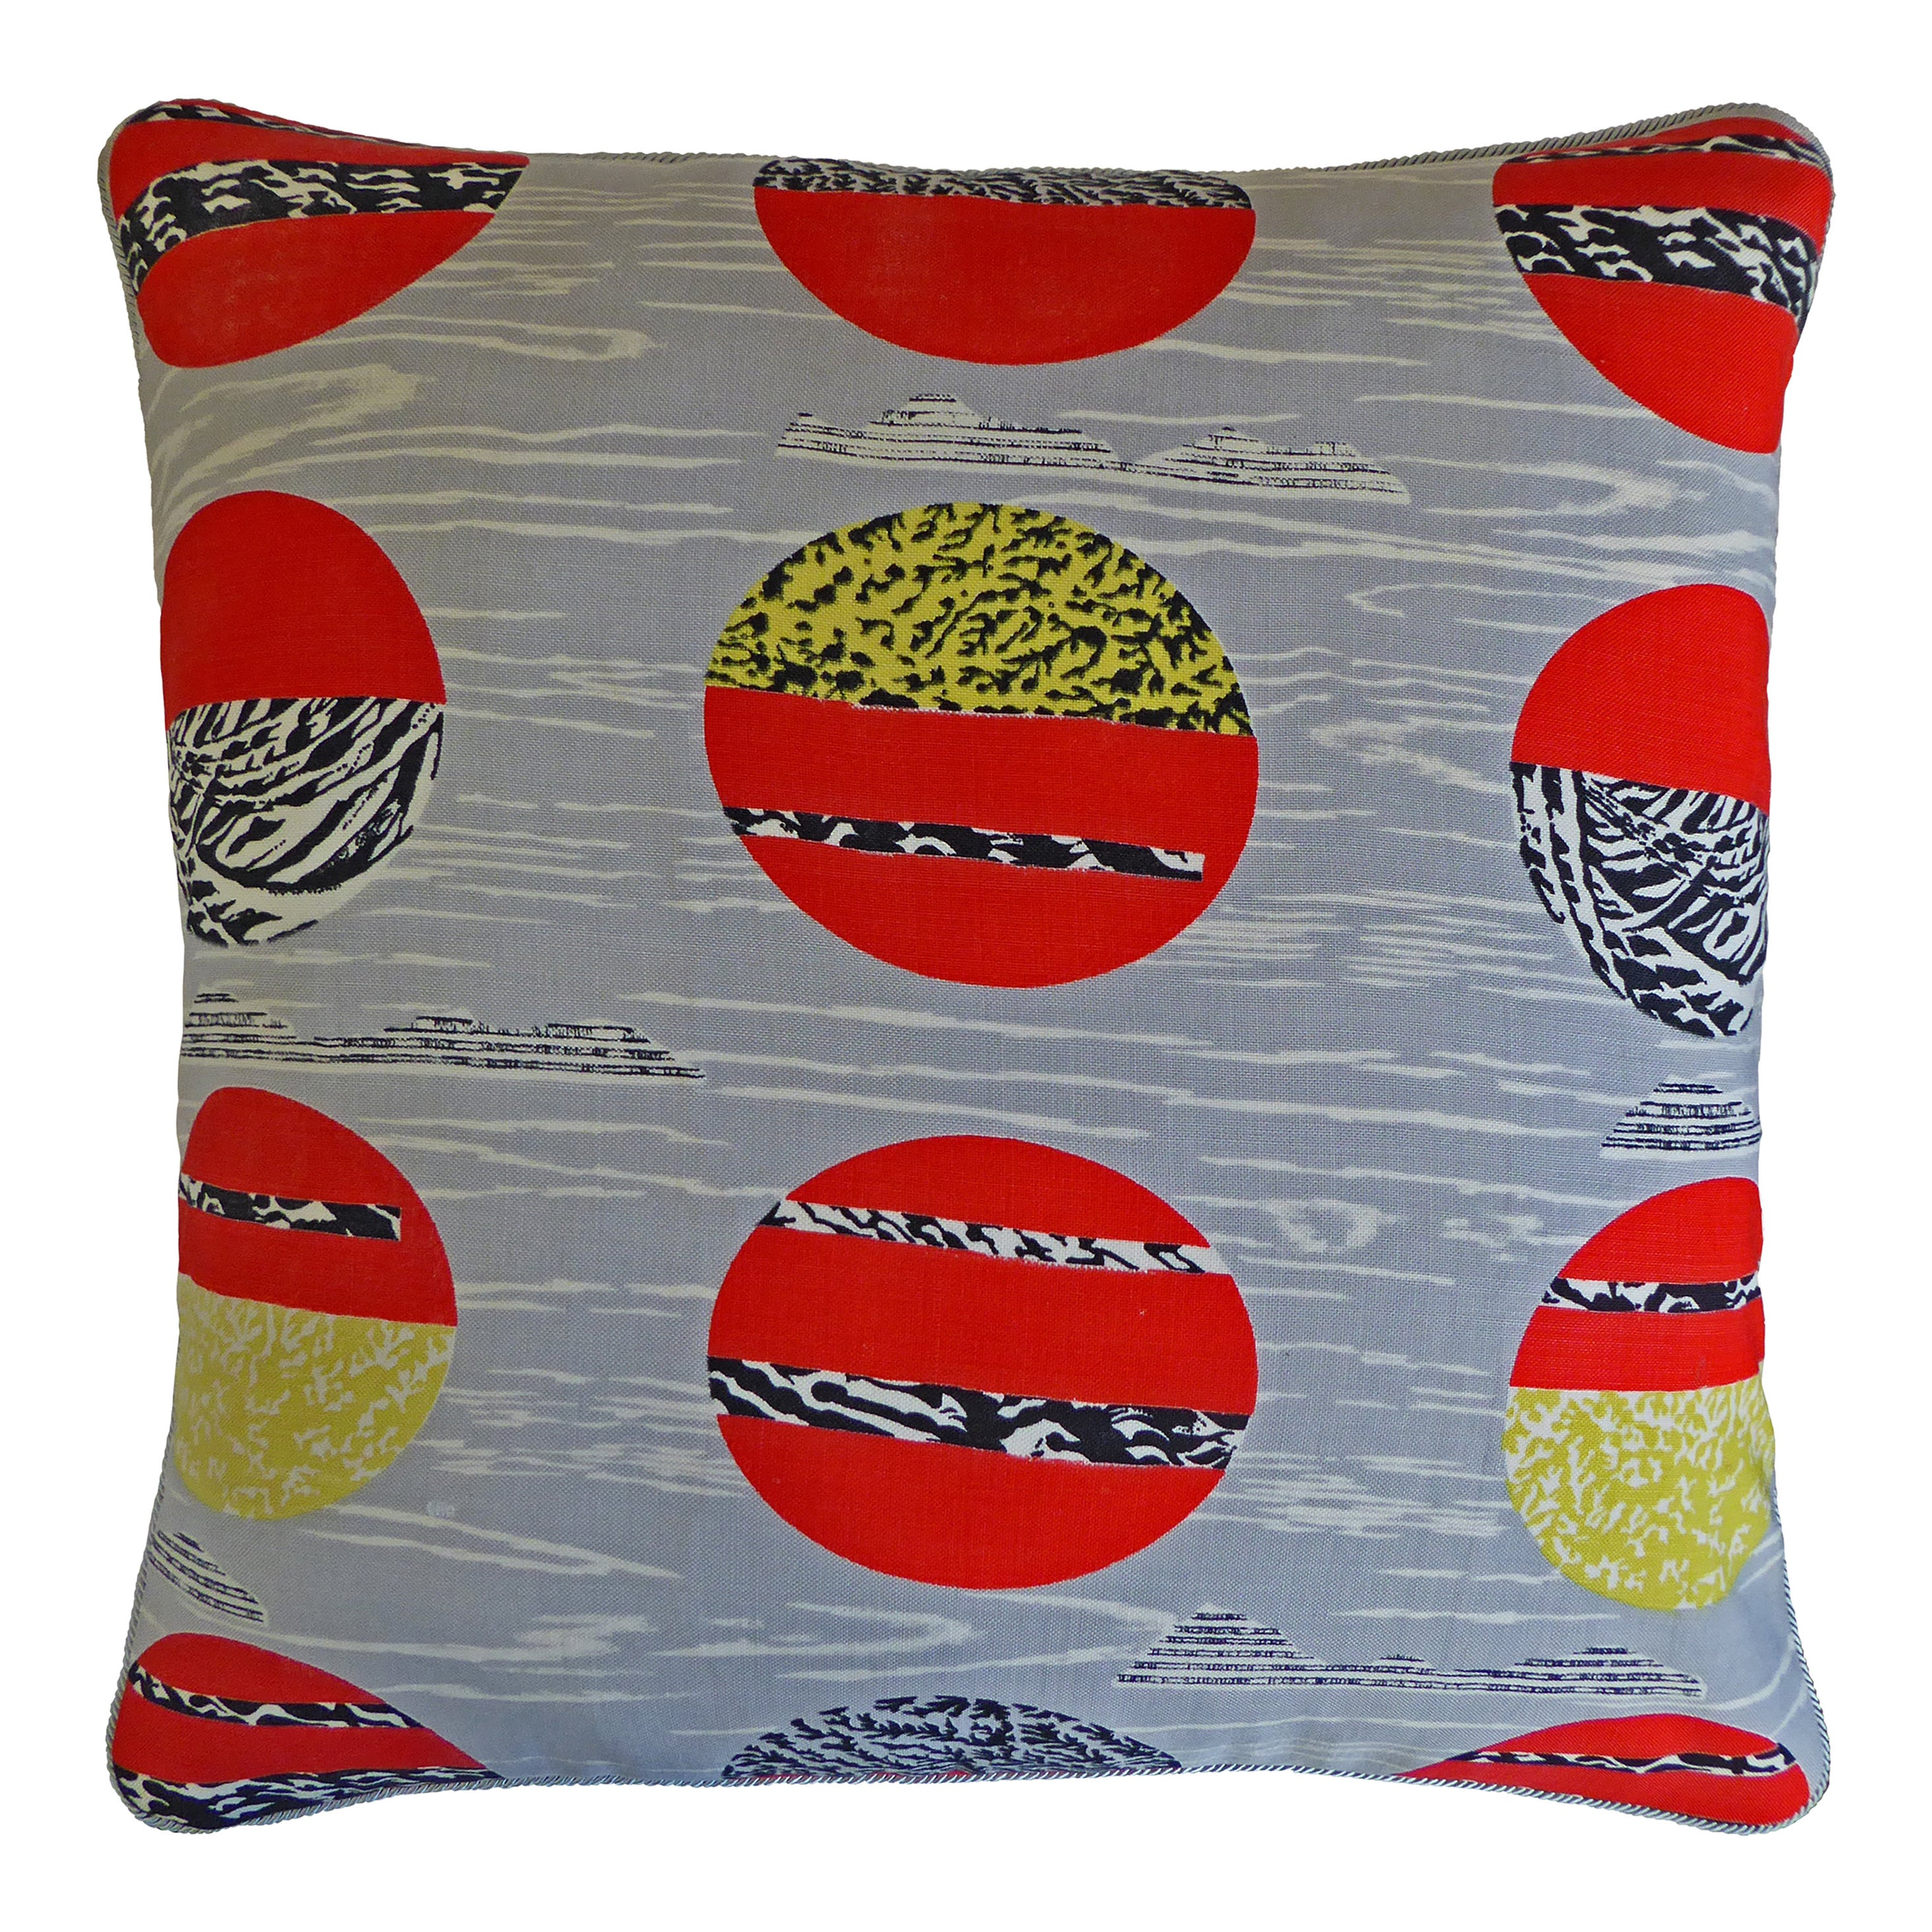 Vintage Cushions, Bespoke-Made Luxury Pillow, 'Globe', Made in UK